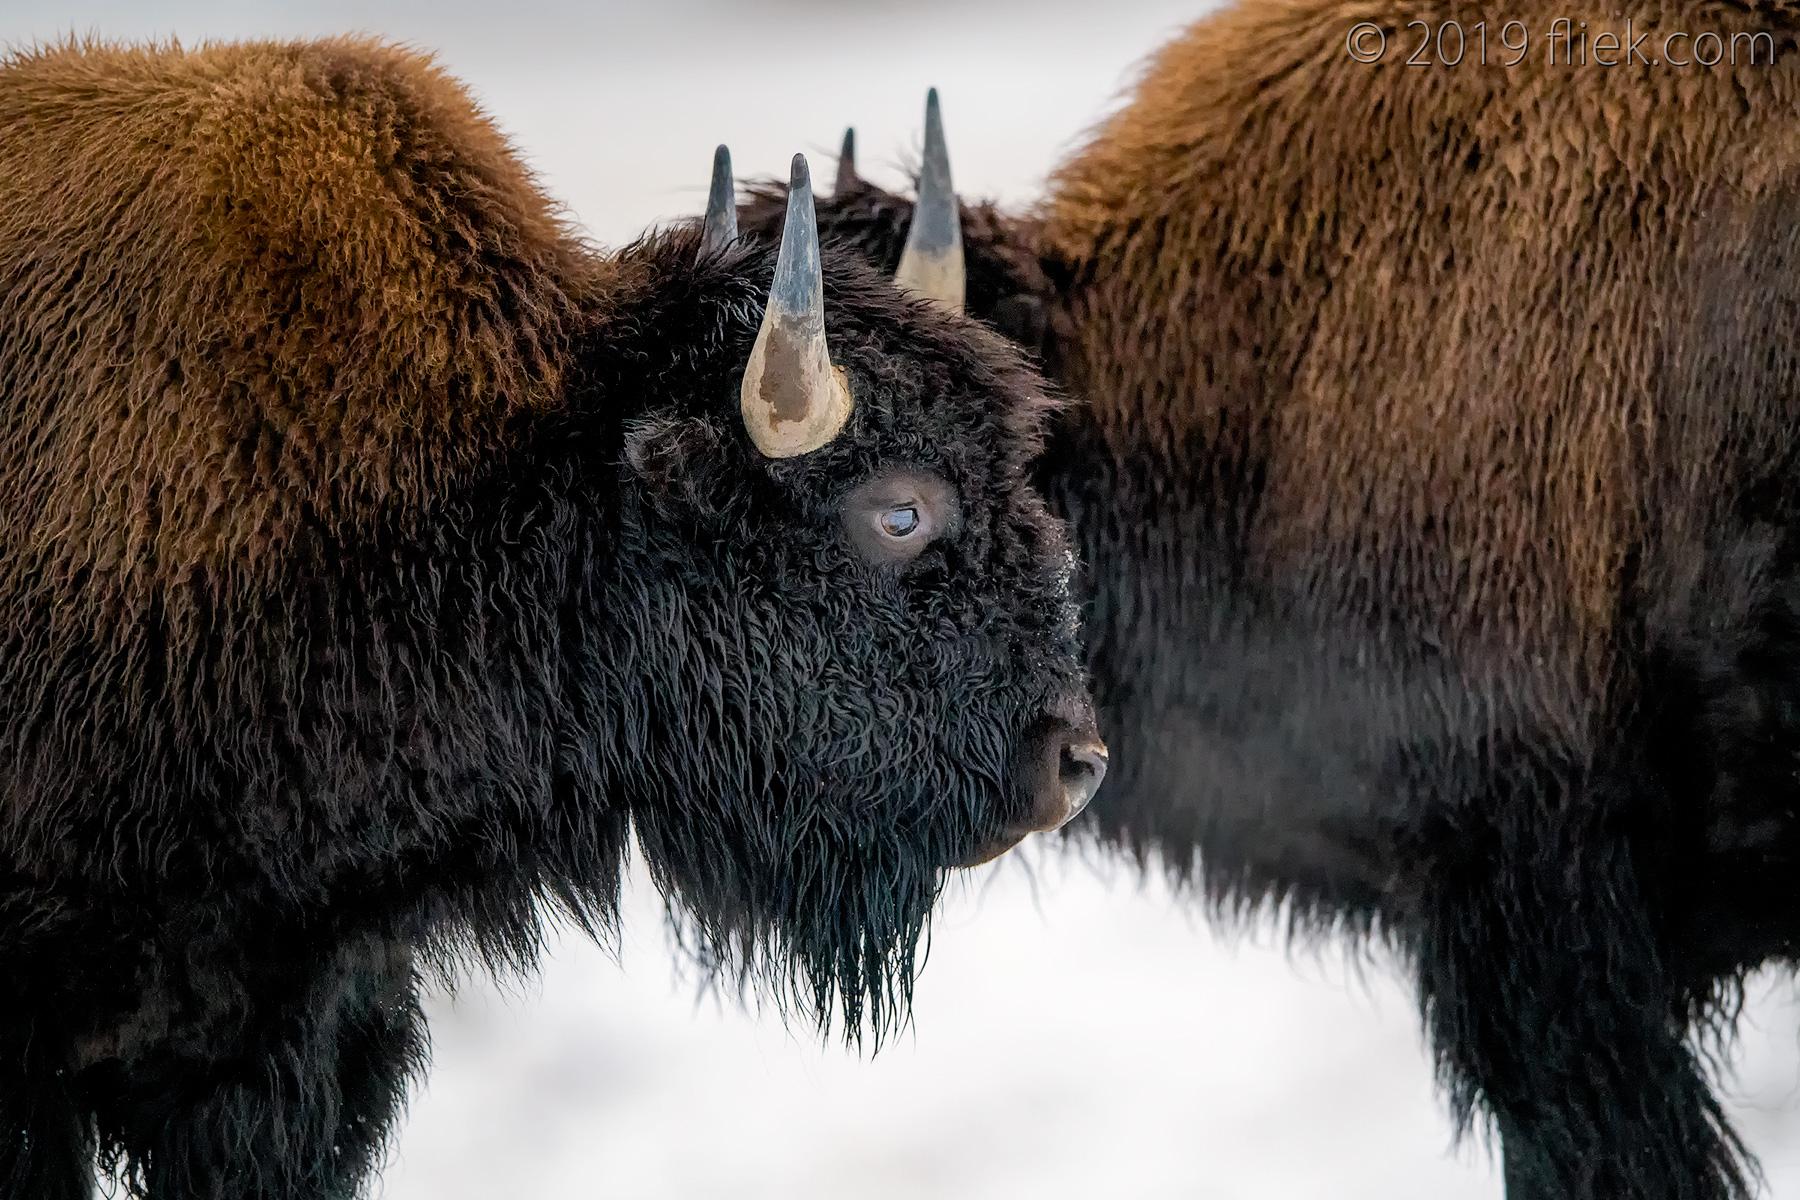 Yellowstone: snowy scenes part II